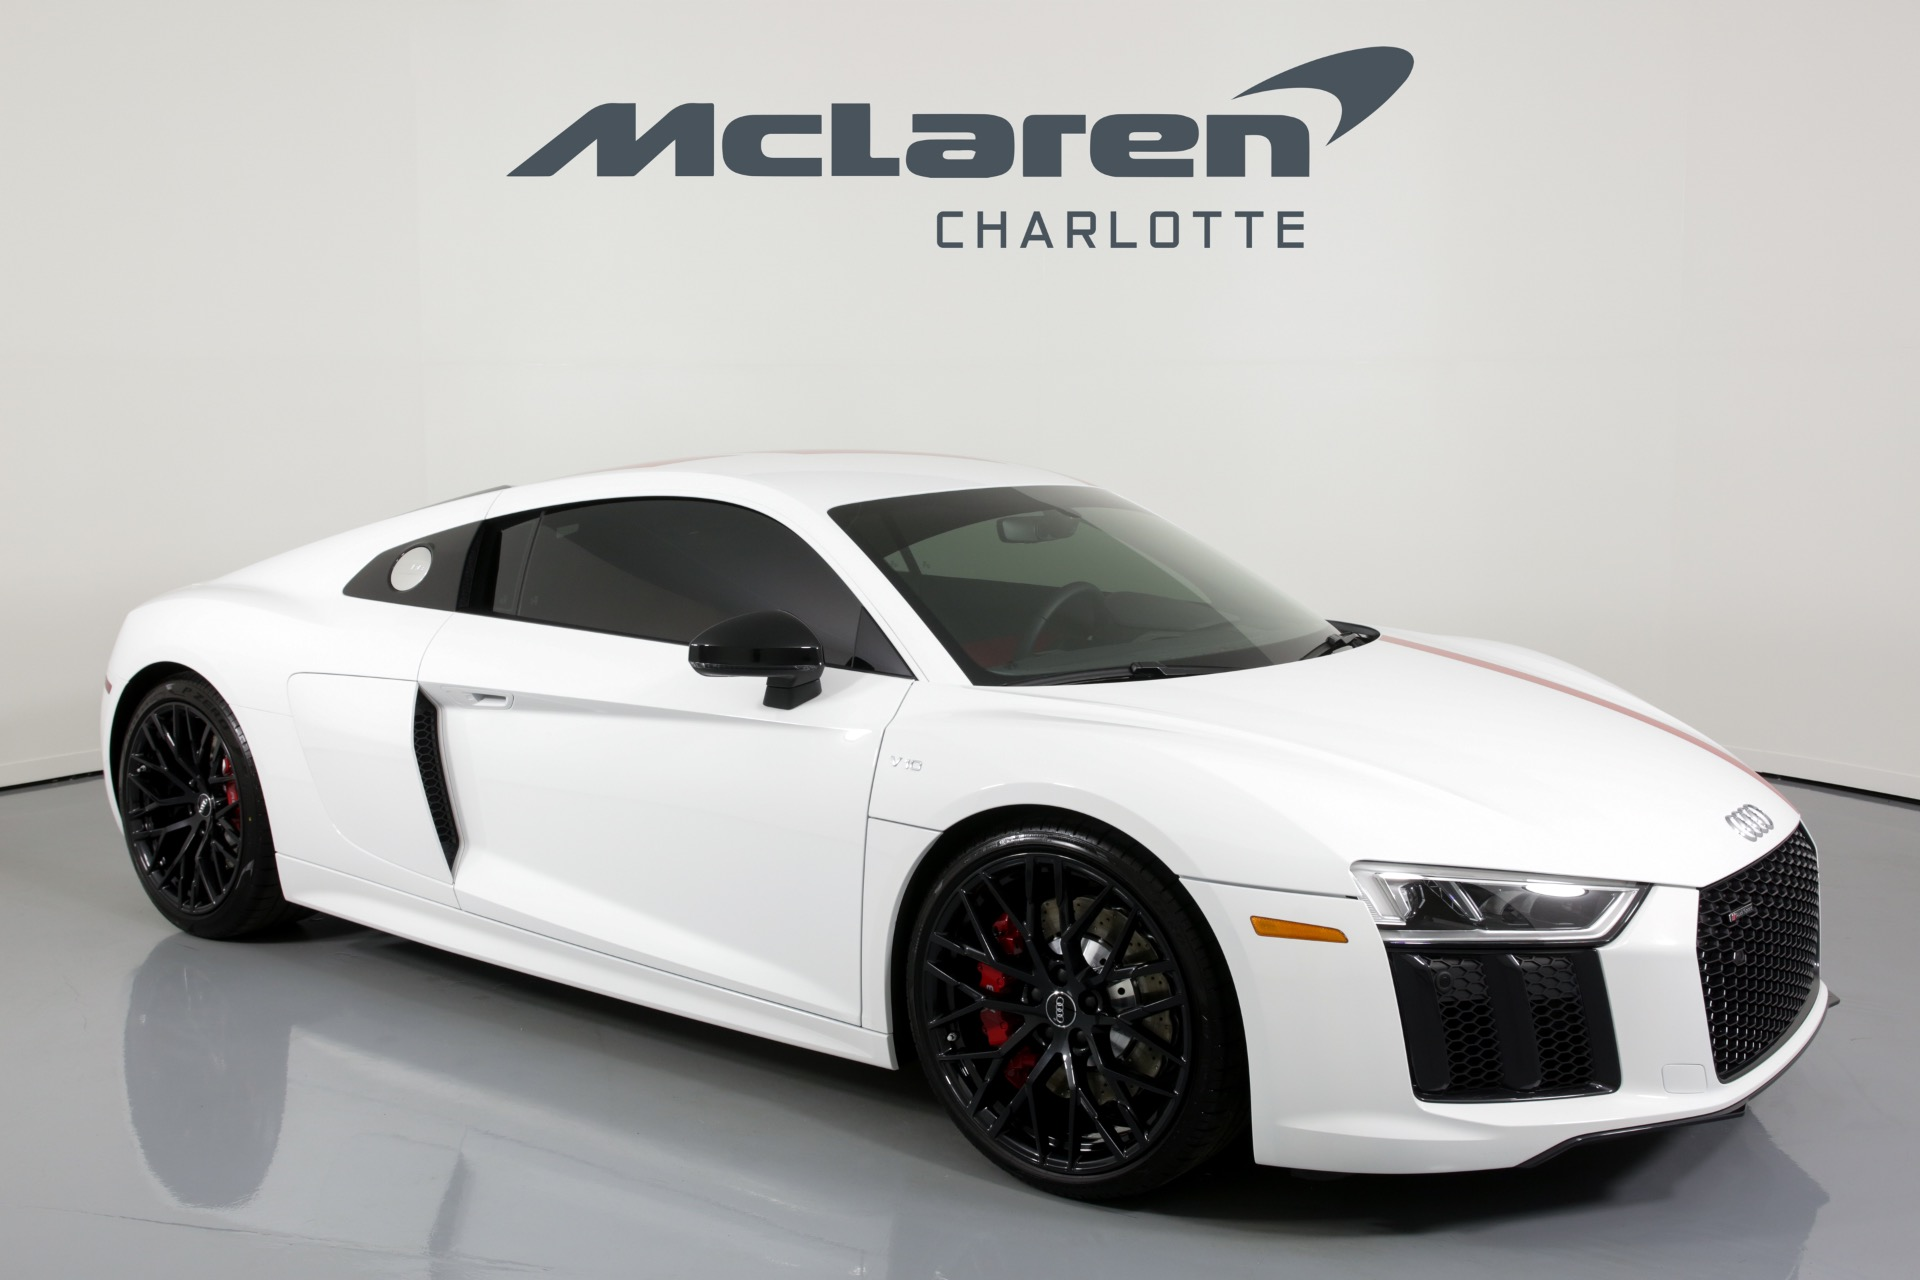 Used 2018 Audi R8 5 2 V10 Rws For Sale 142 845 Mclaren